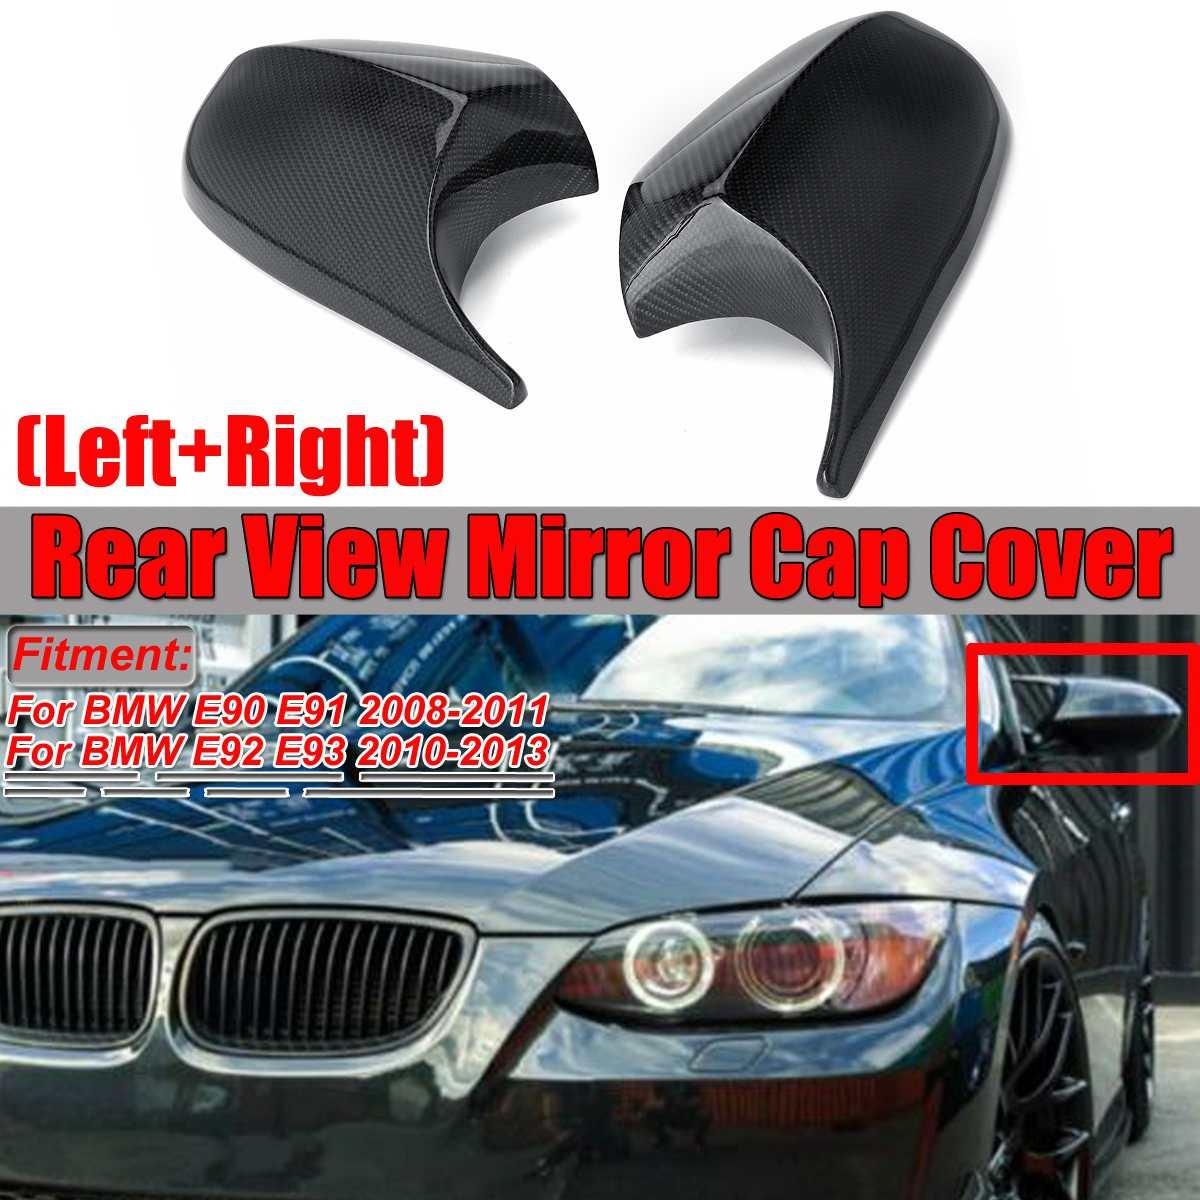 2PCS Real Carbon Fiber/ABS Spiegel Abdeckung E90 Auto Rückspiegel Kappe Abdeckung Direkt Ersetzen Für BMW E90 e91 08-11 E92 E93 10-13 LCI